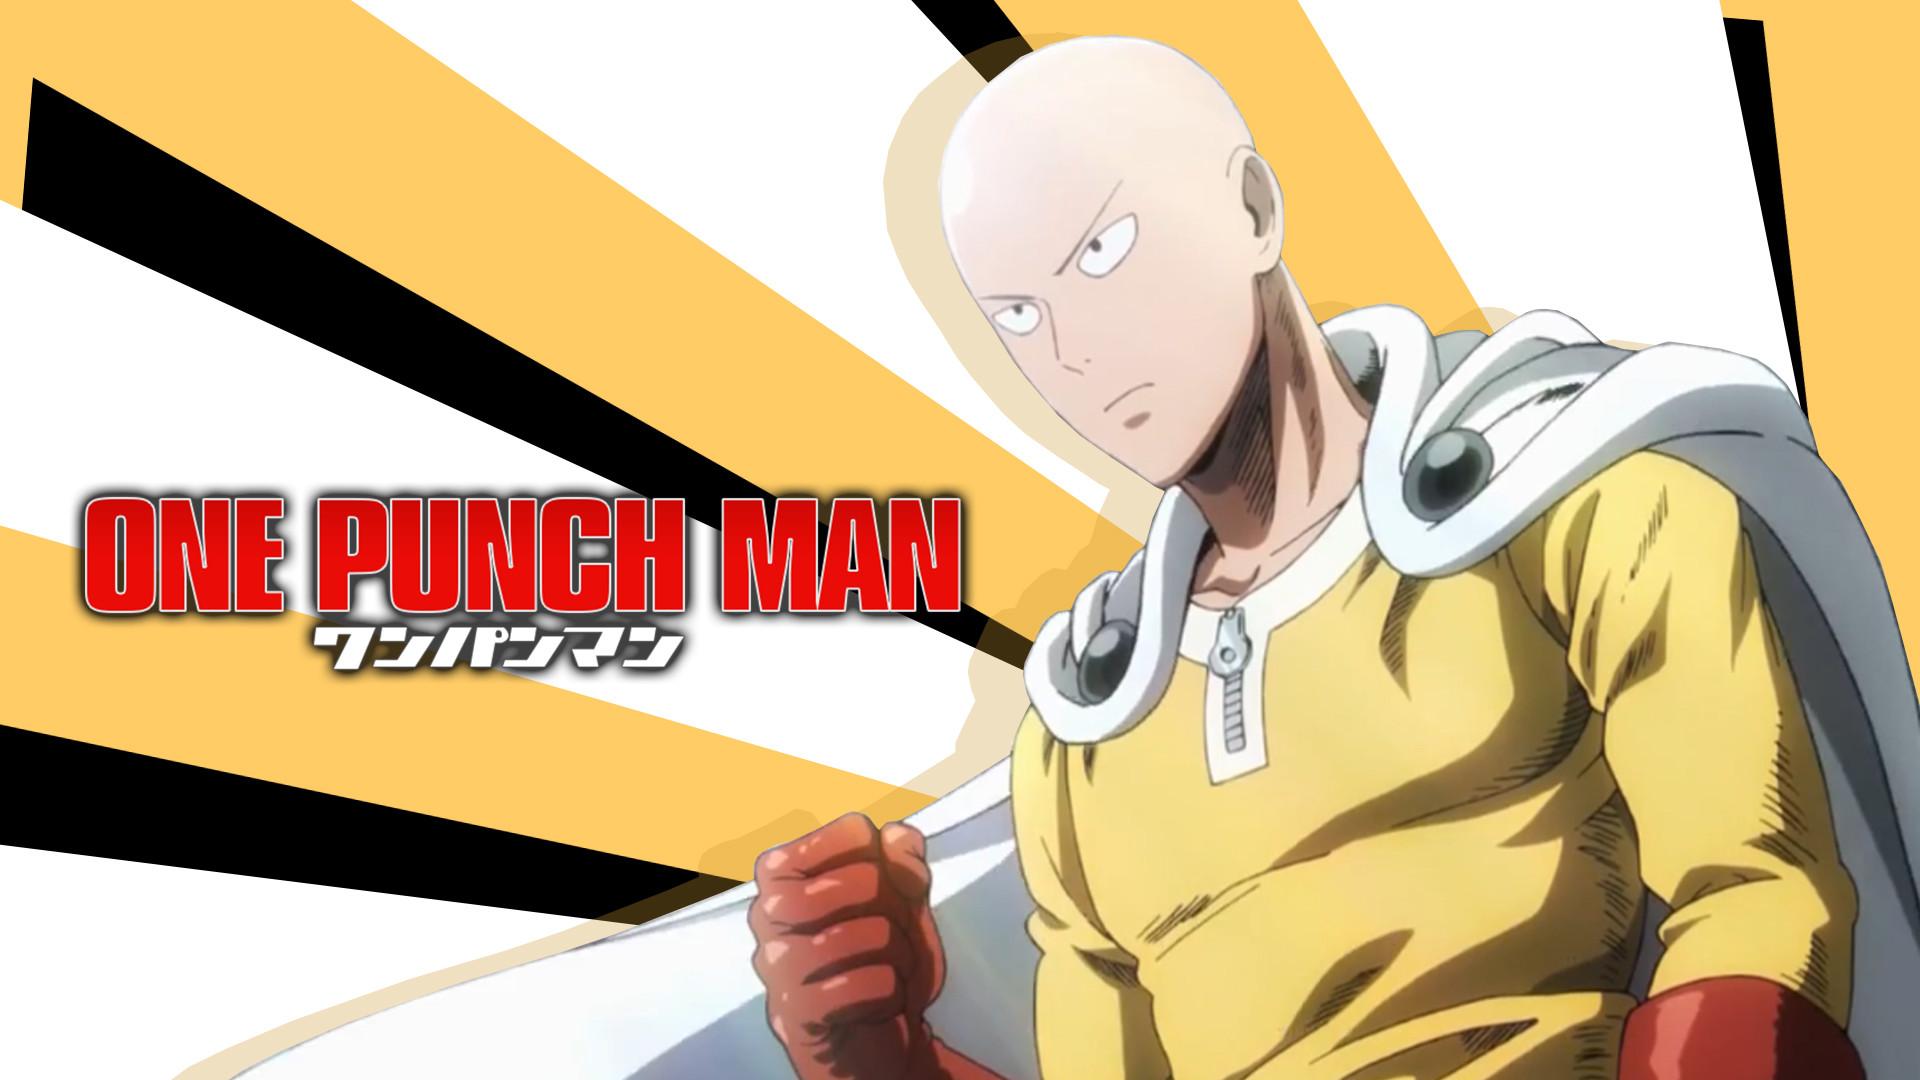 Cool Saitama Anime One Punch Man Wallpaper HD #3020